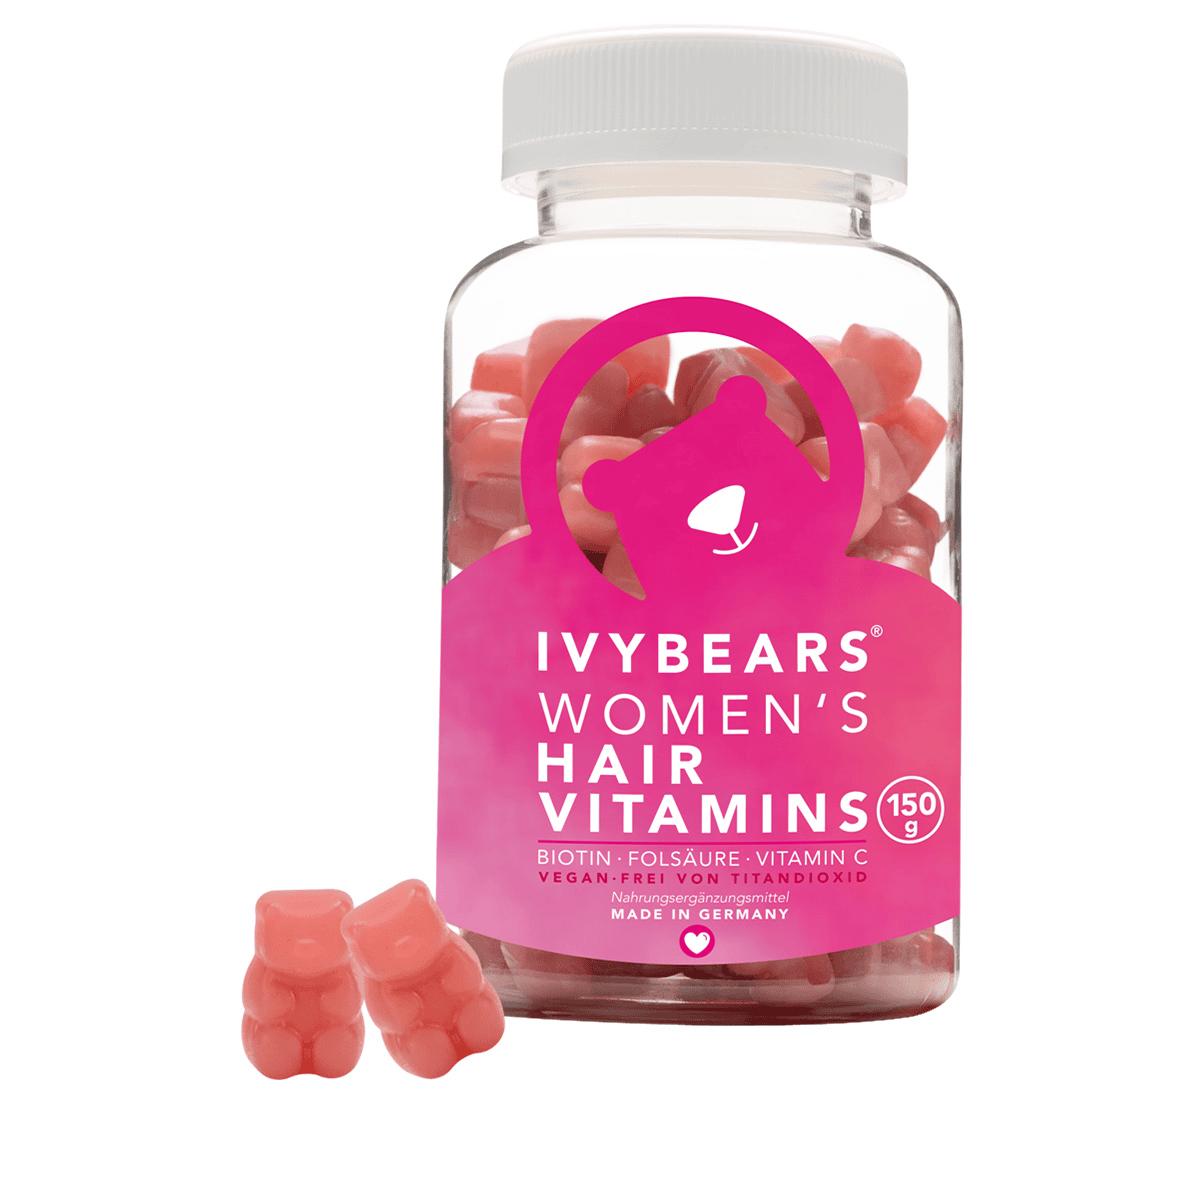 Ivybears Hair Vitamins For Women 150g Haar Shop Ch hair vitamins for women